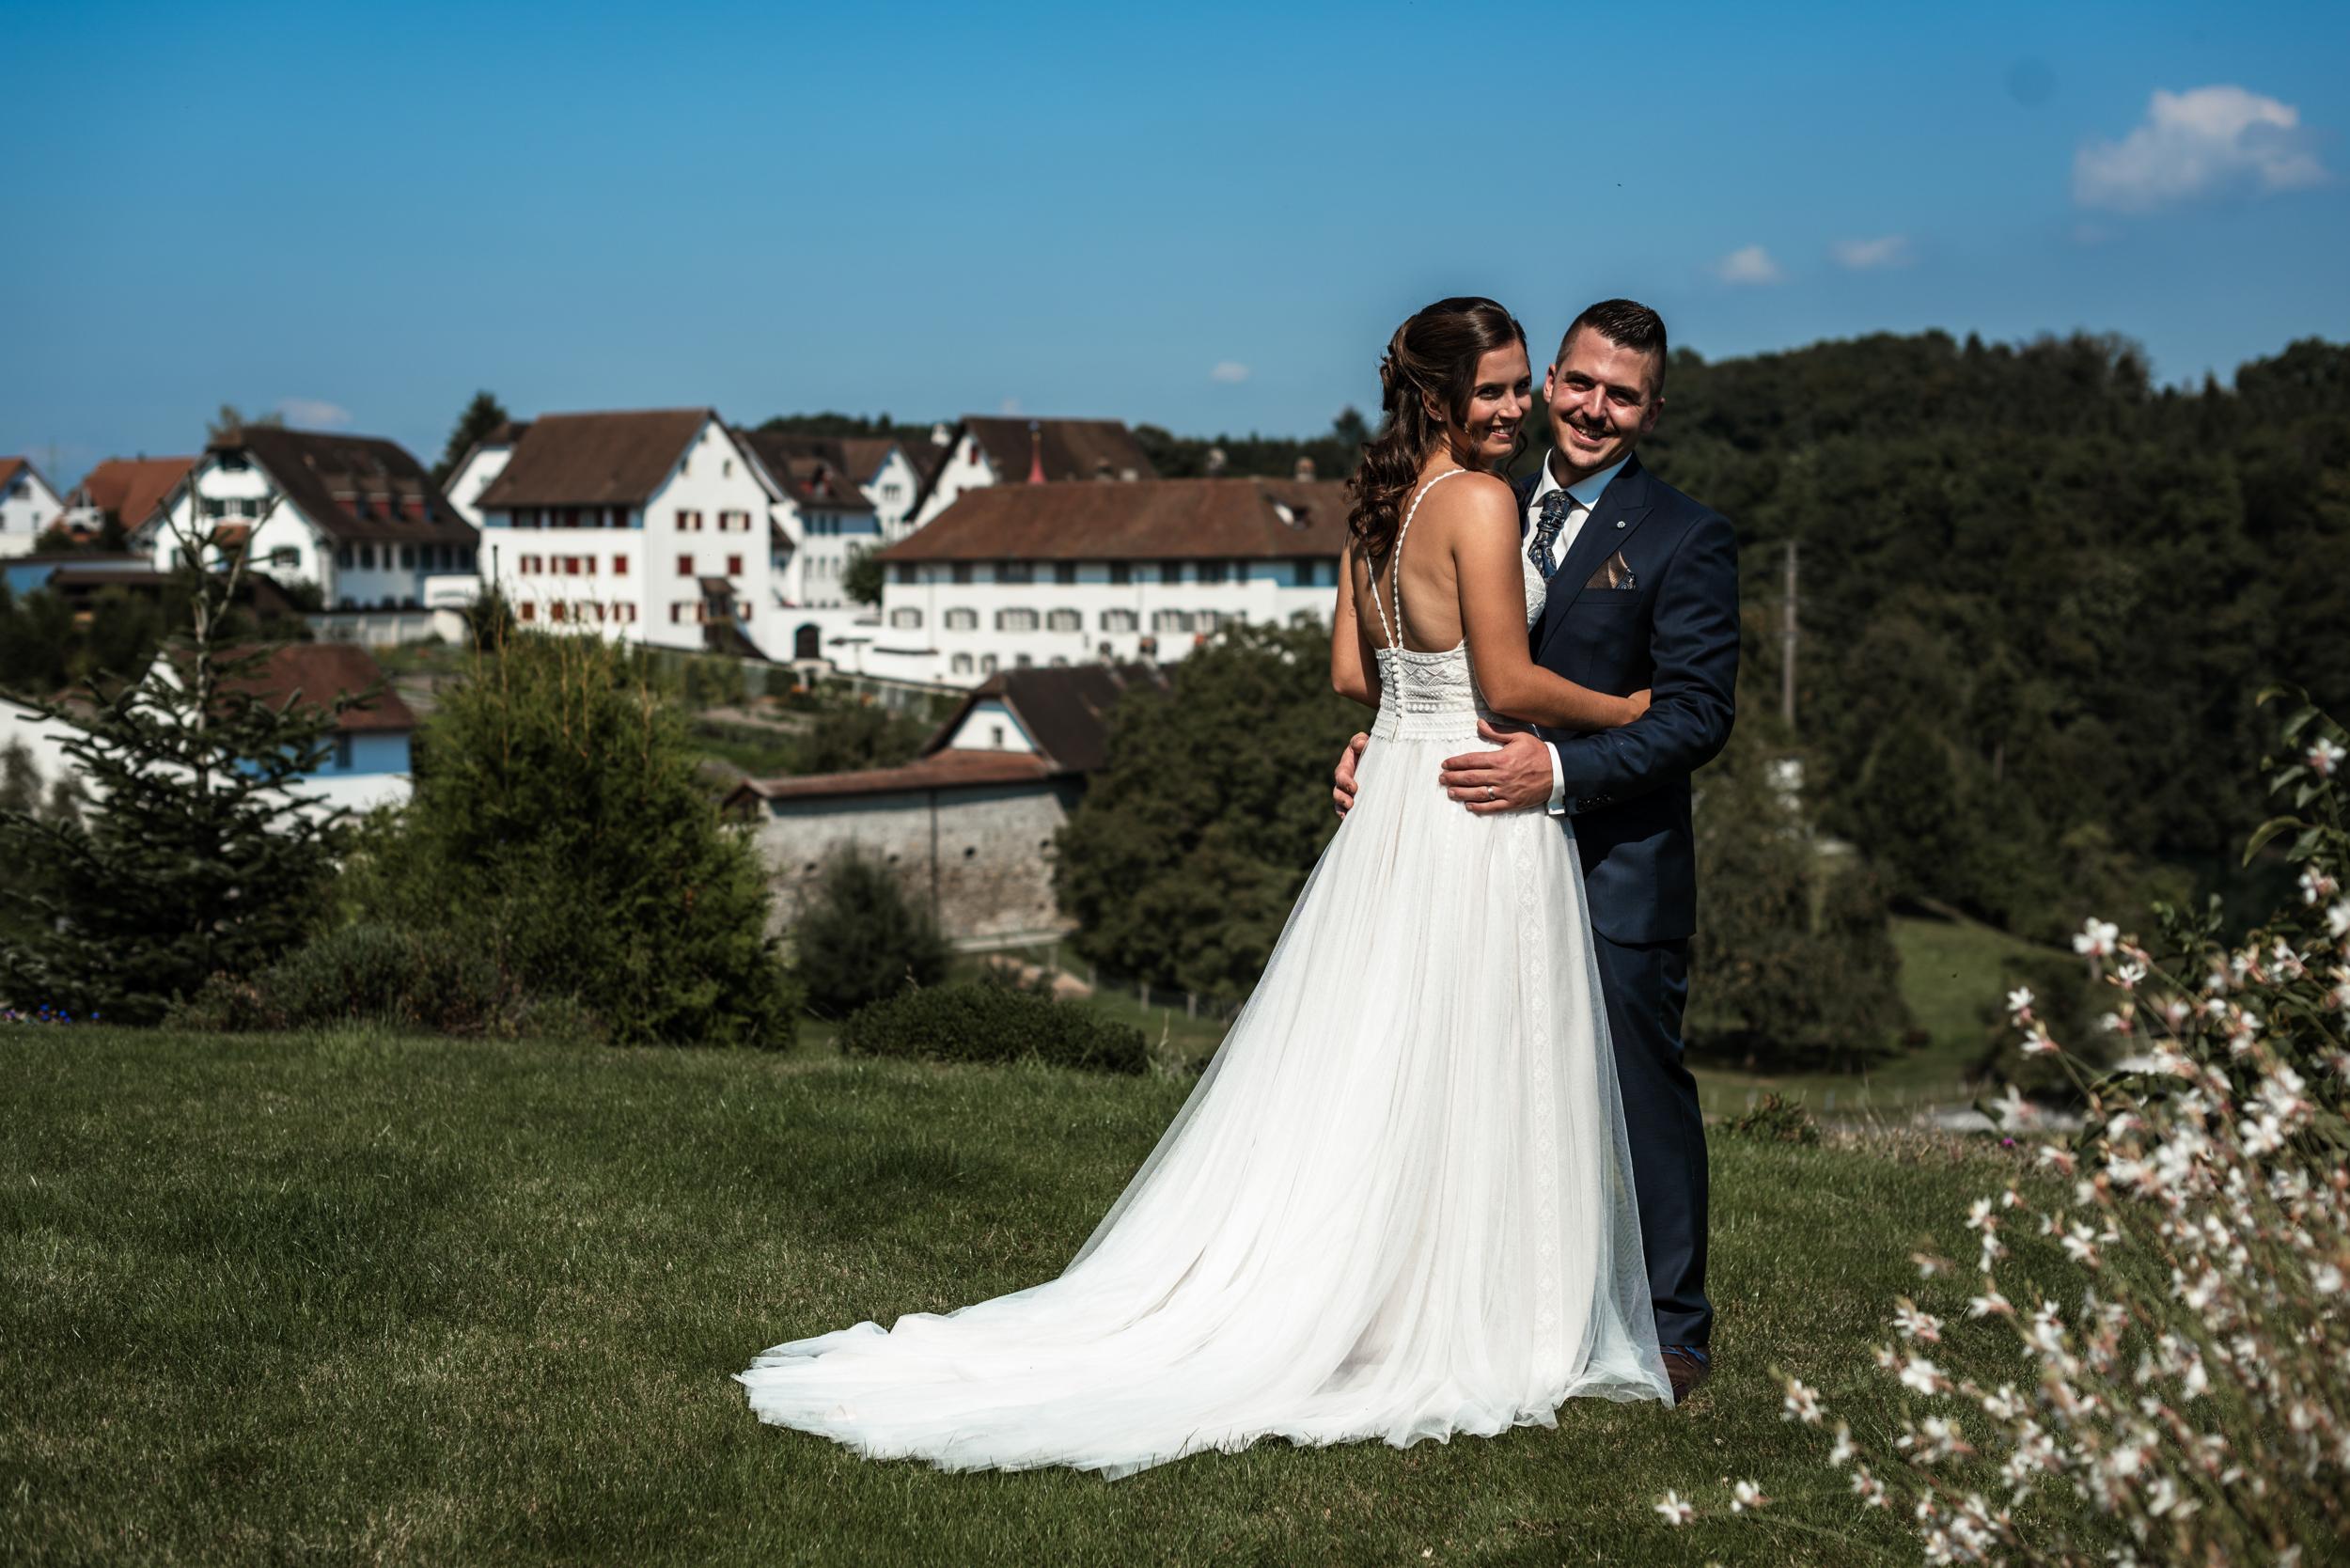 Hochzeit_Rilana-Fabian_28